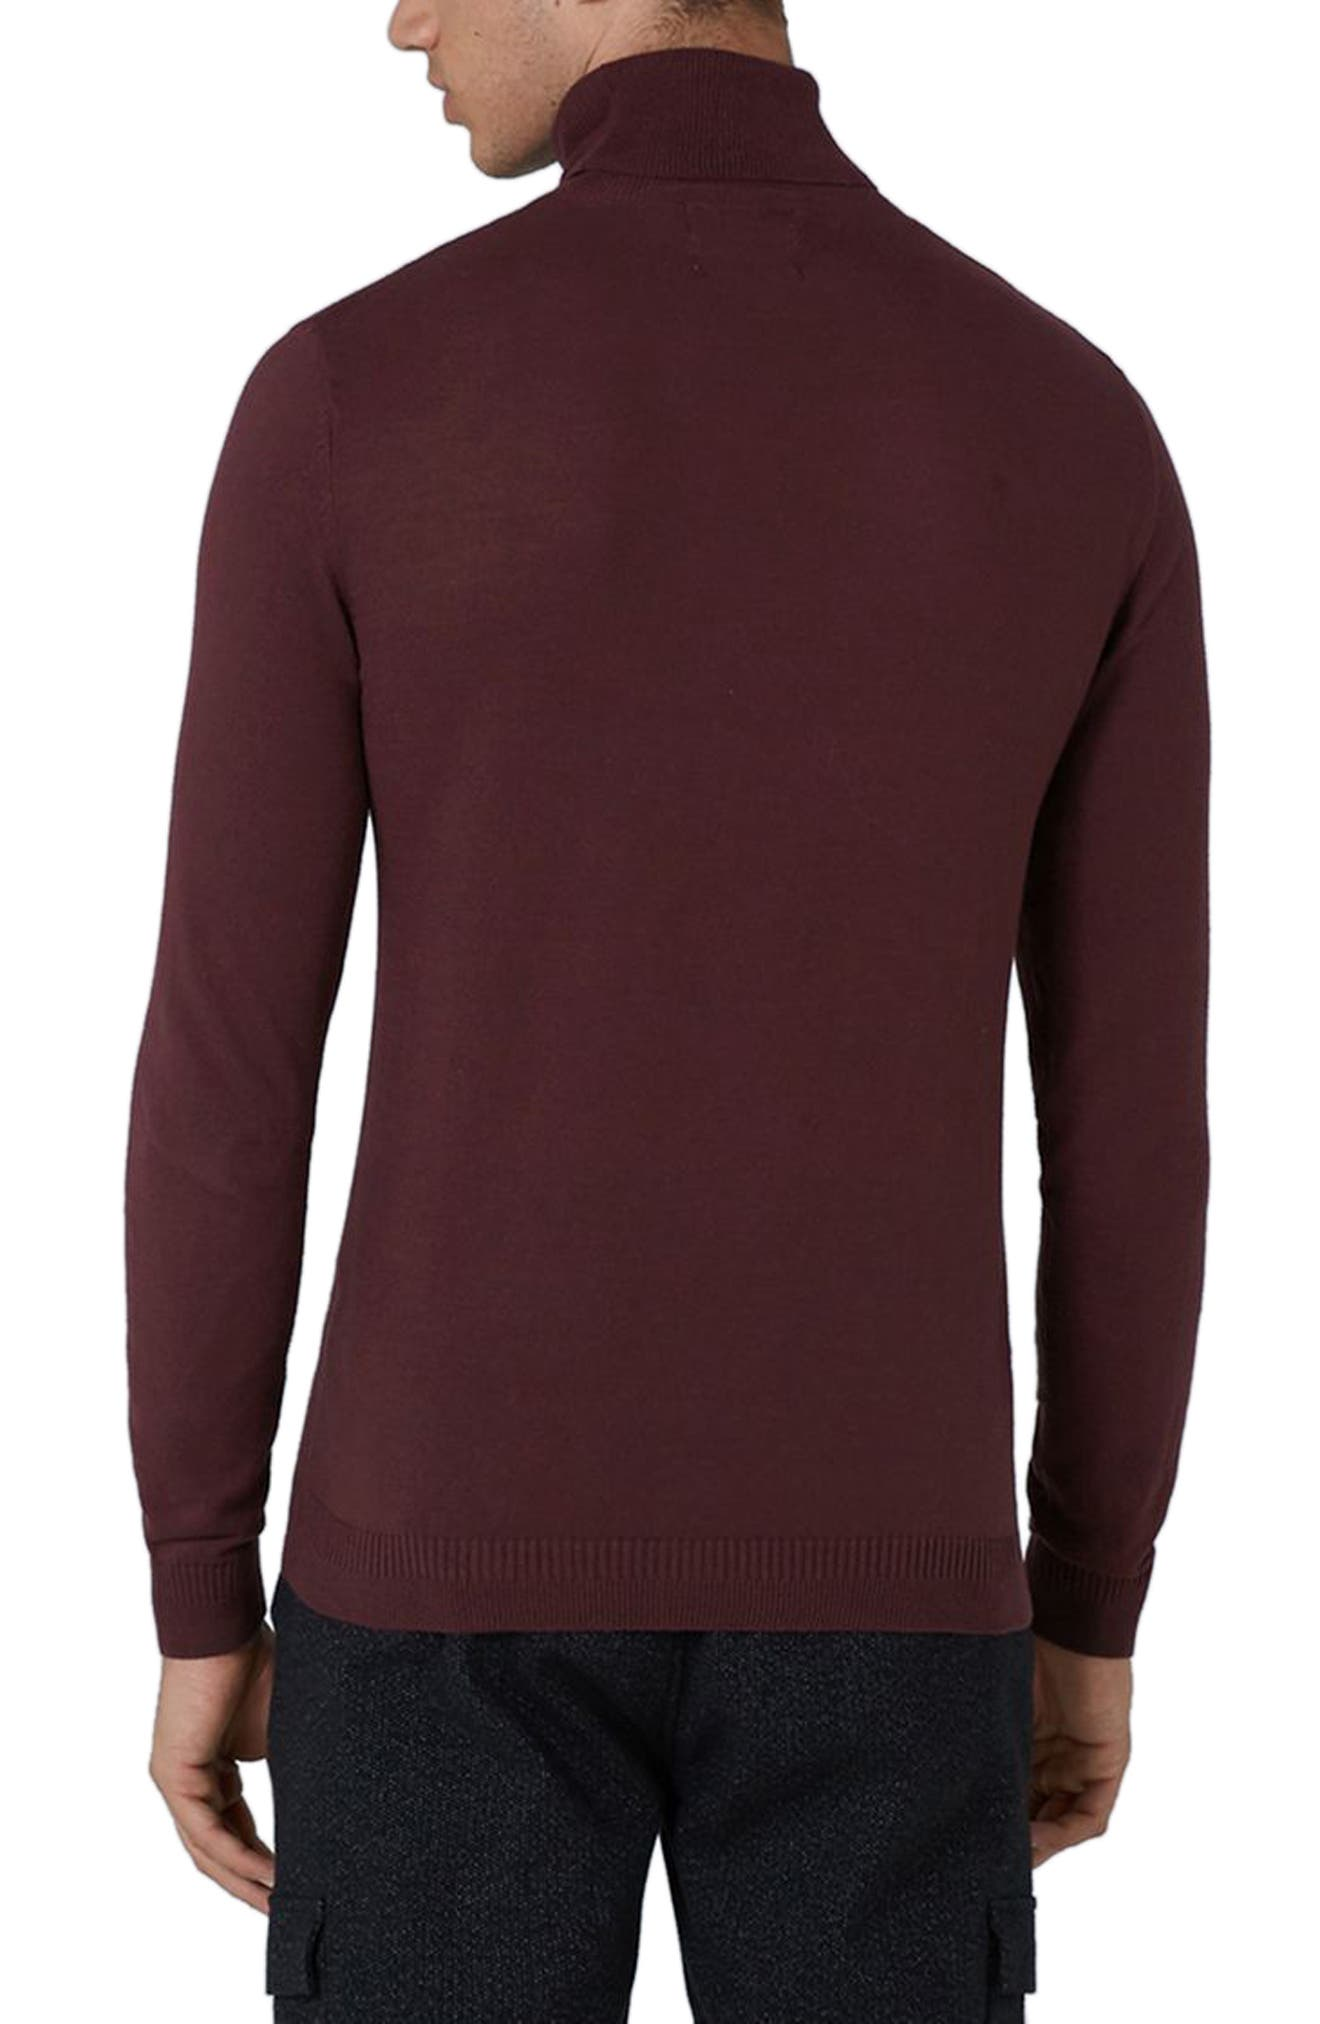 Cotton Turtleneck Sweater,                             Alternate thumbnail 6, color,